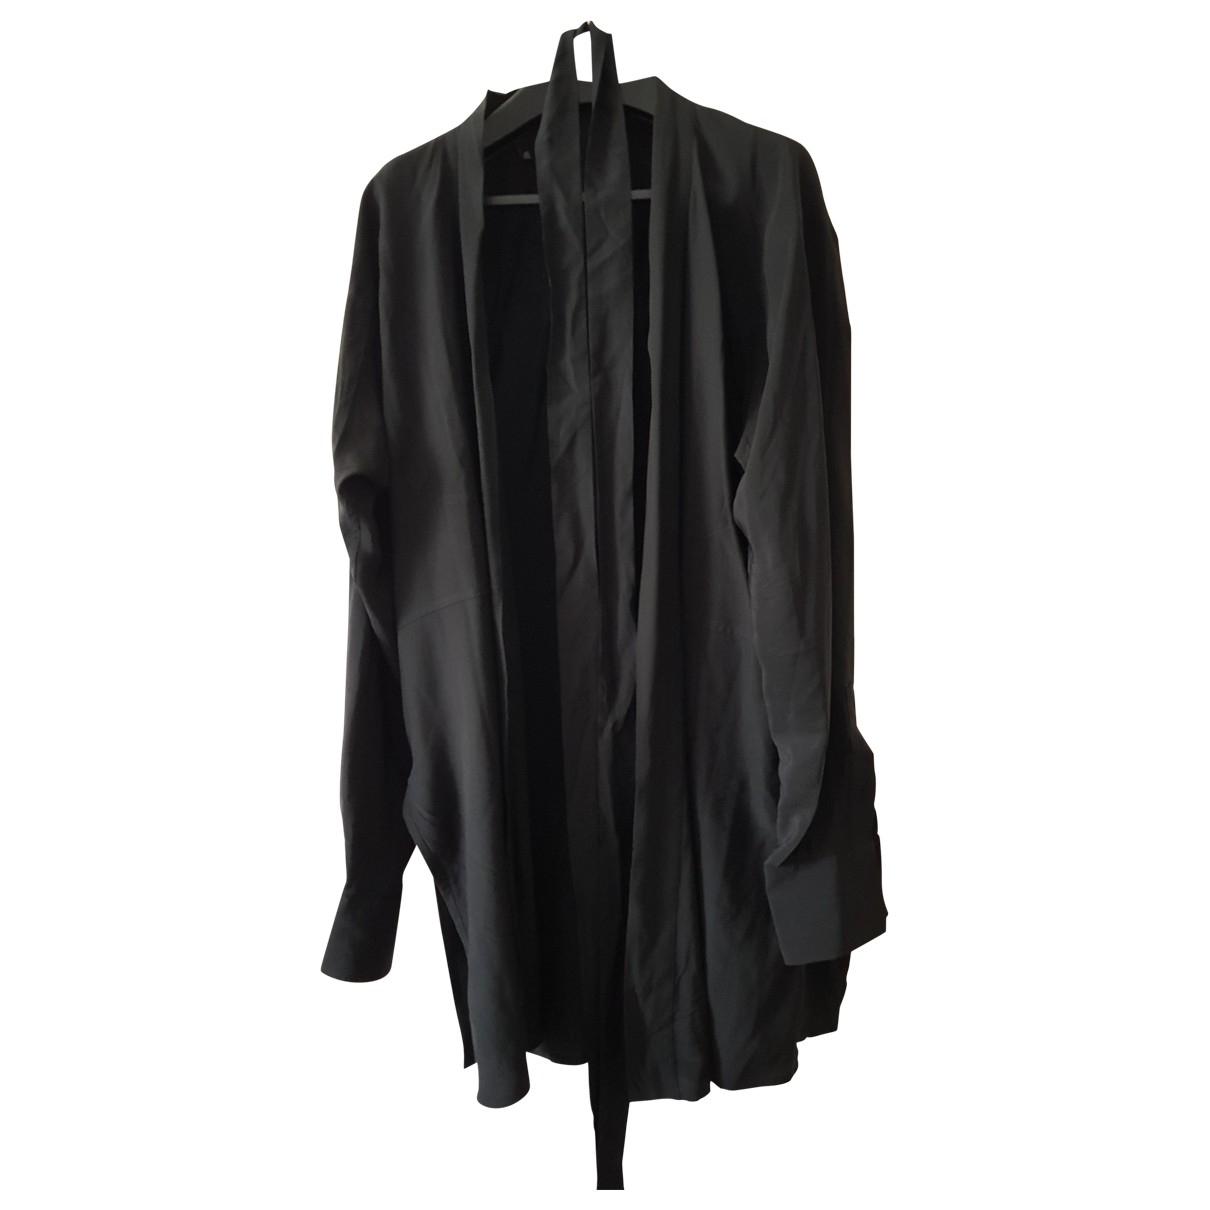 Gucci N Black Silk Shirts for Men 40 EU (tour de cou / collar)